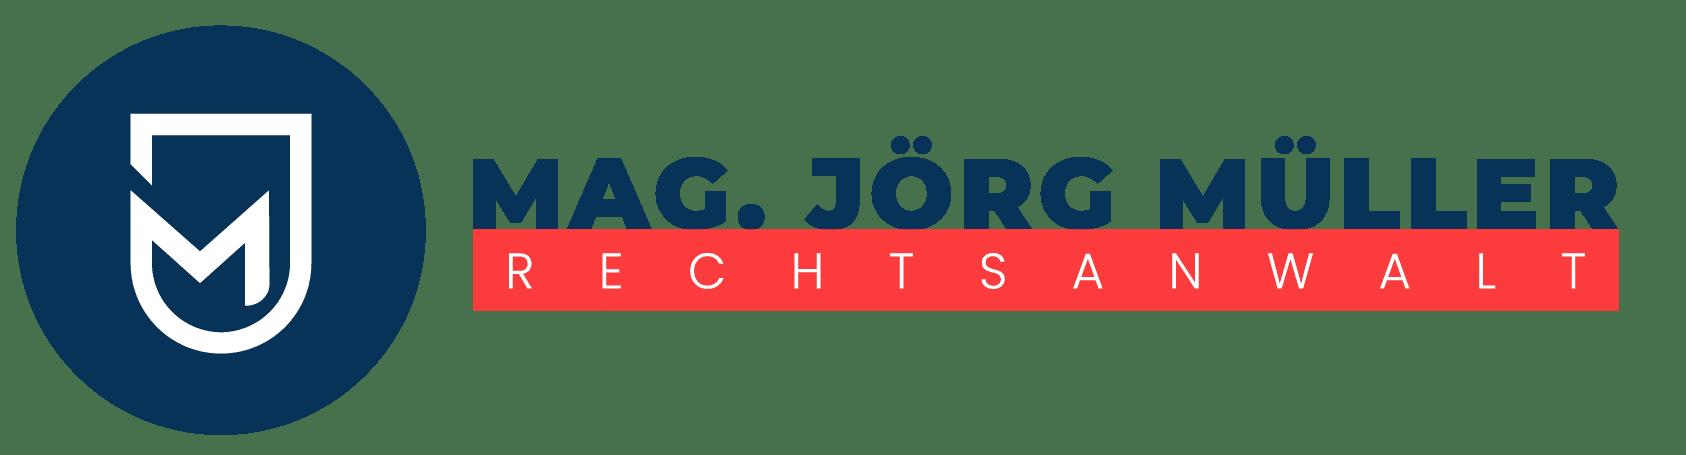 Mag. Joerg C. Mueller 1010 Wien Logo